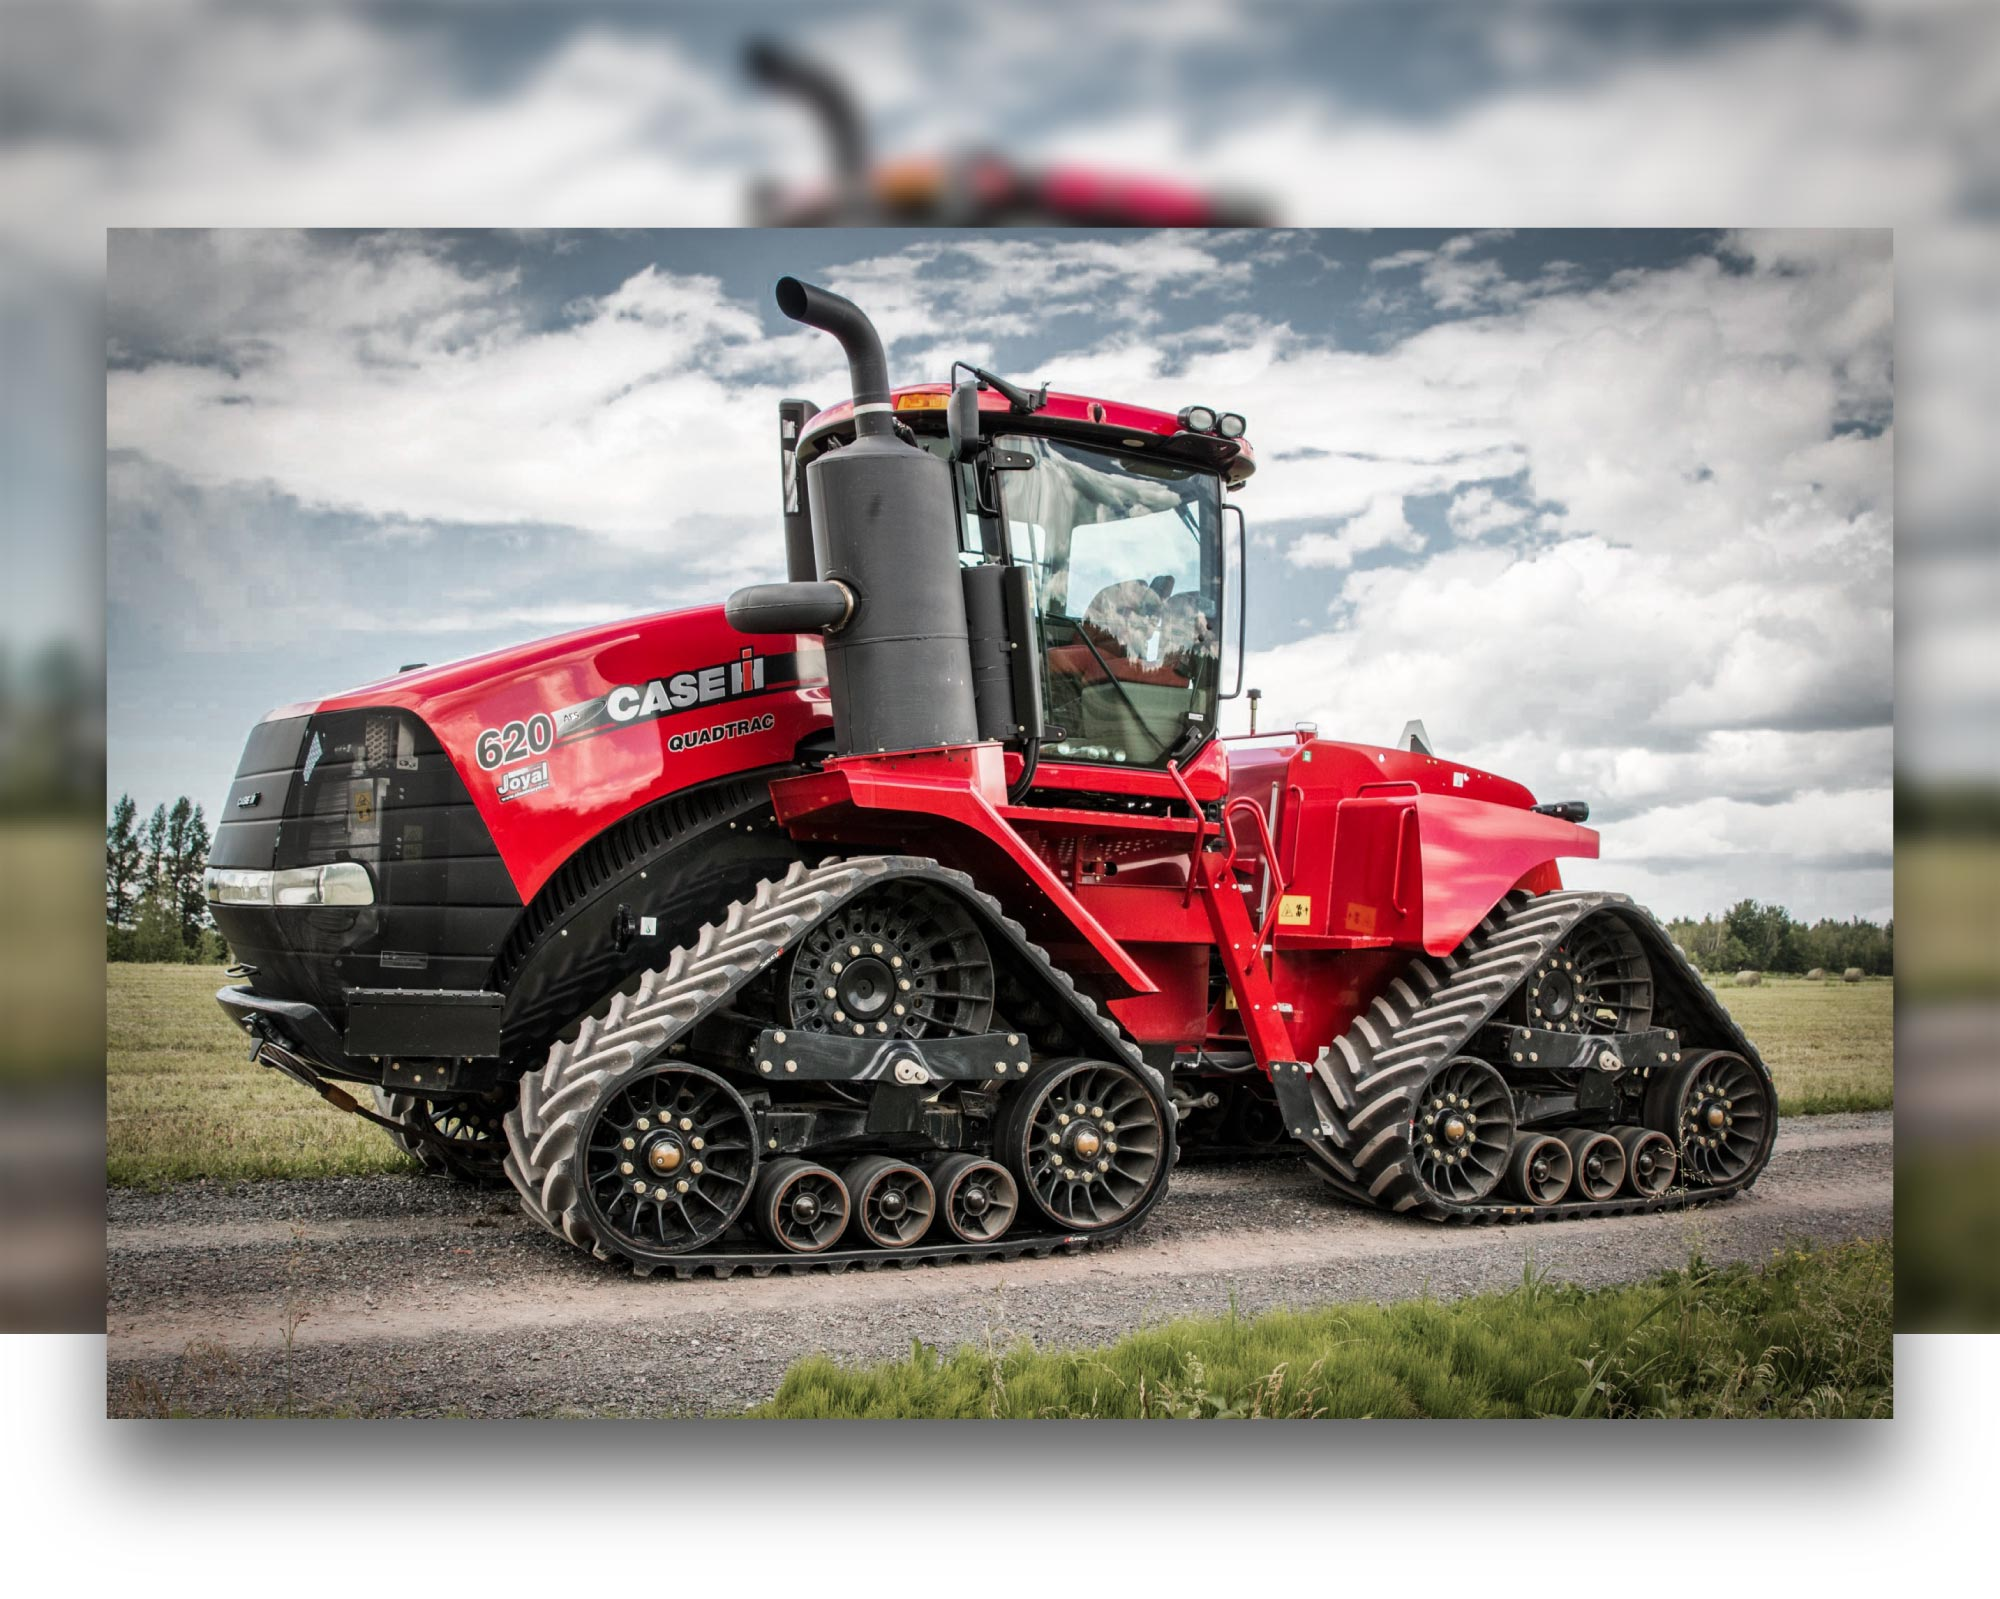 Soucy tracks for Case IH Quadtrac tractor